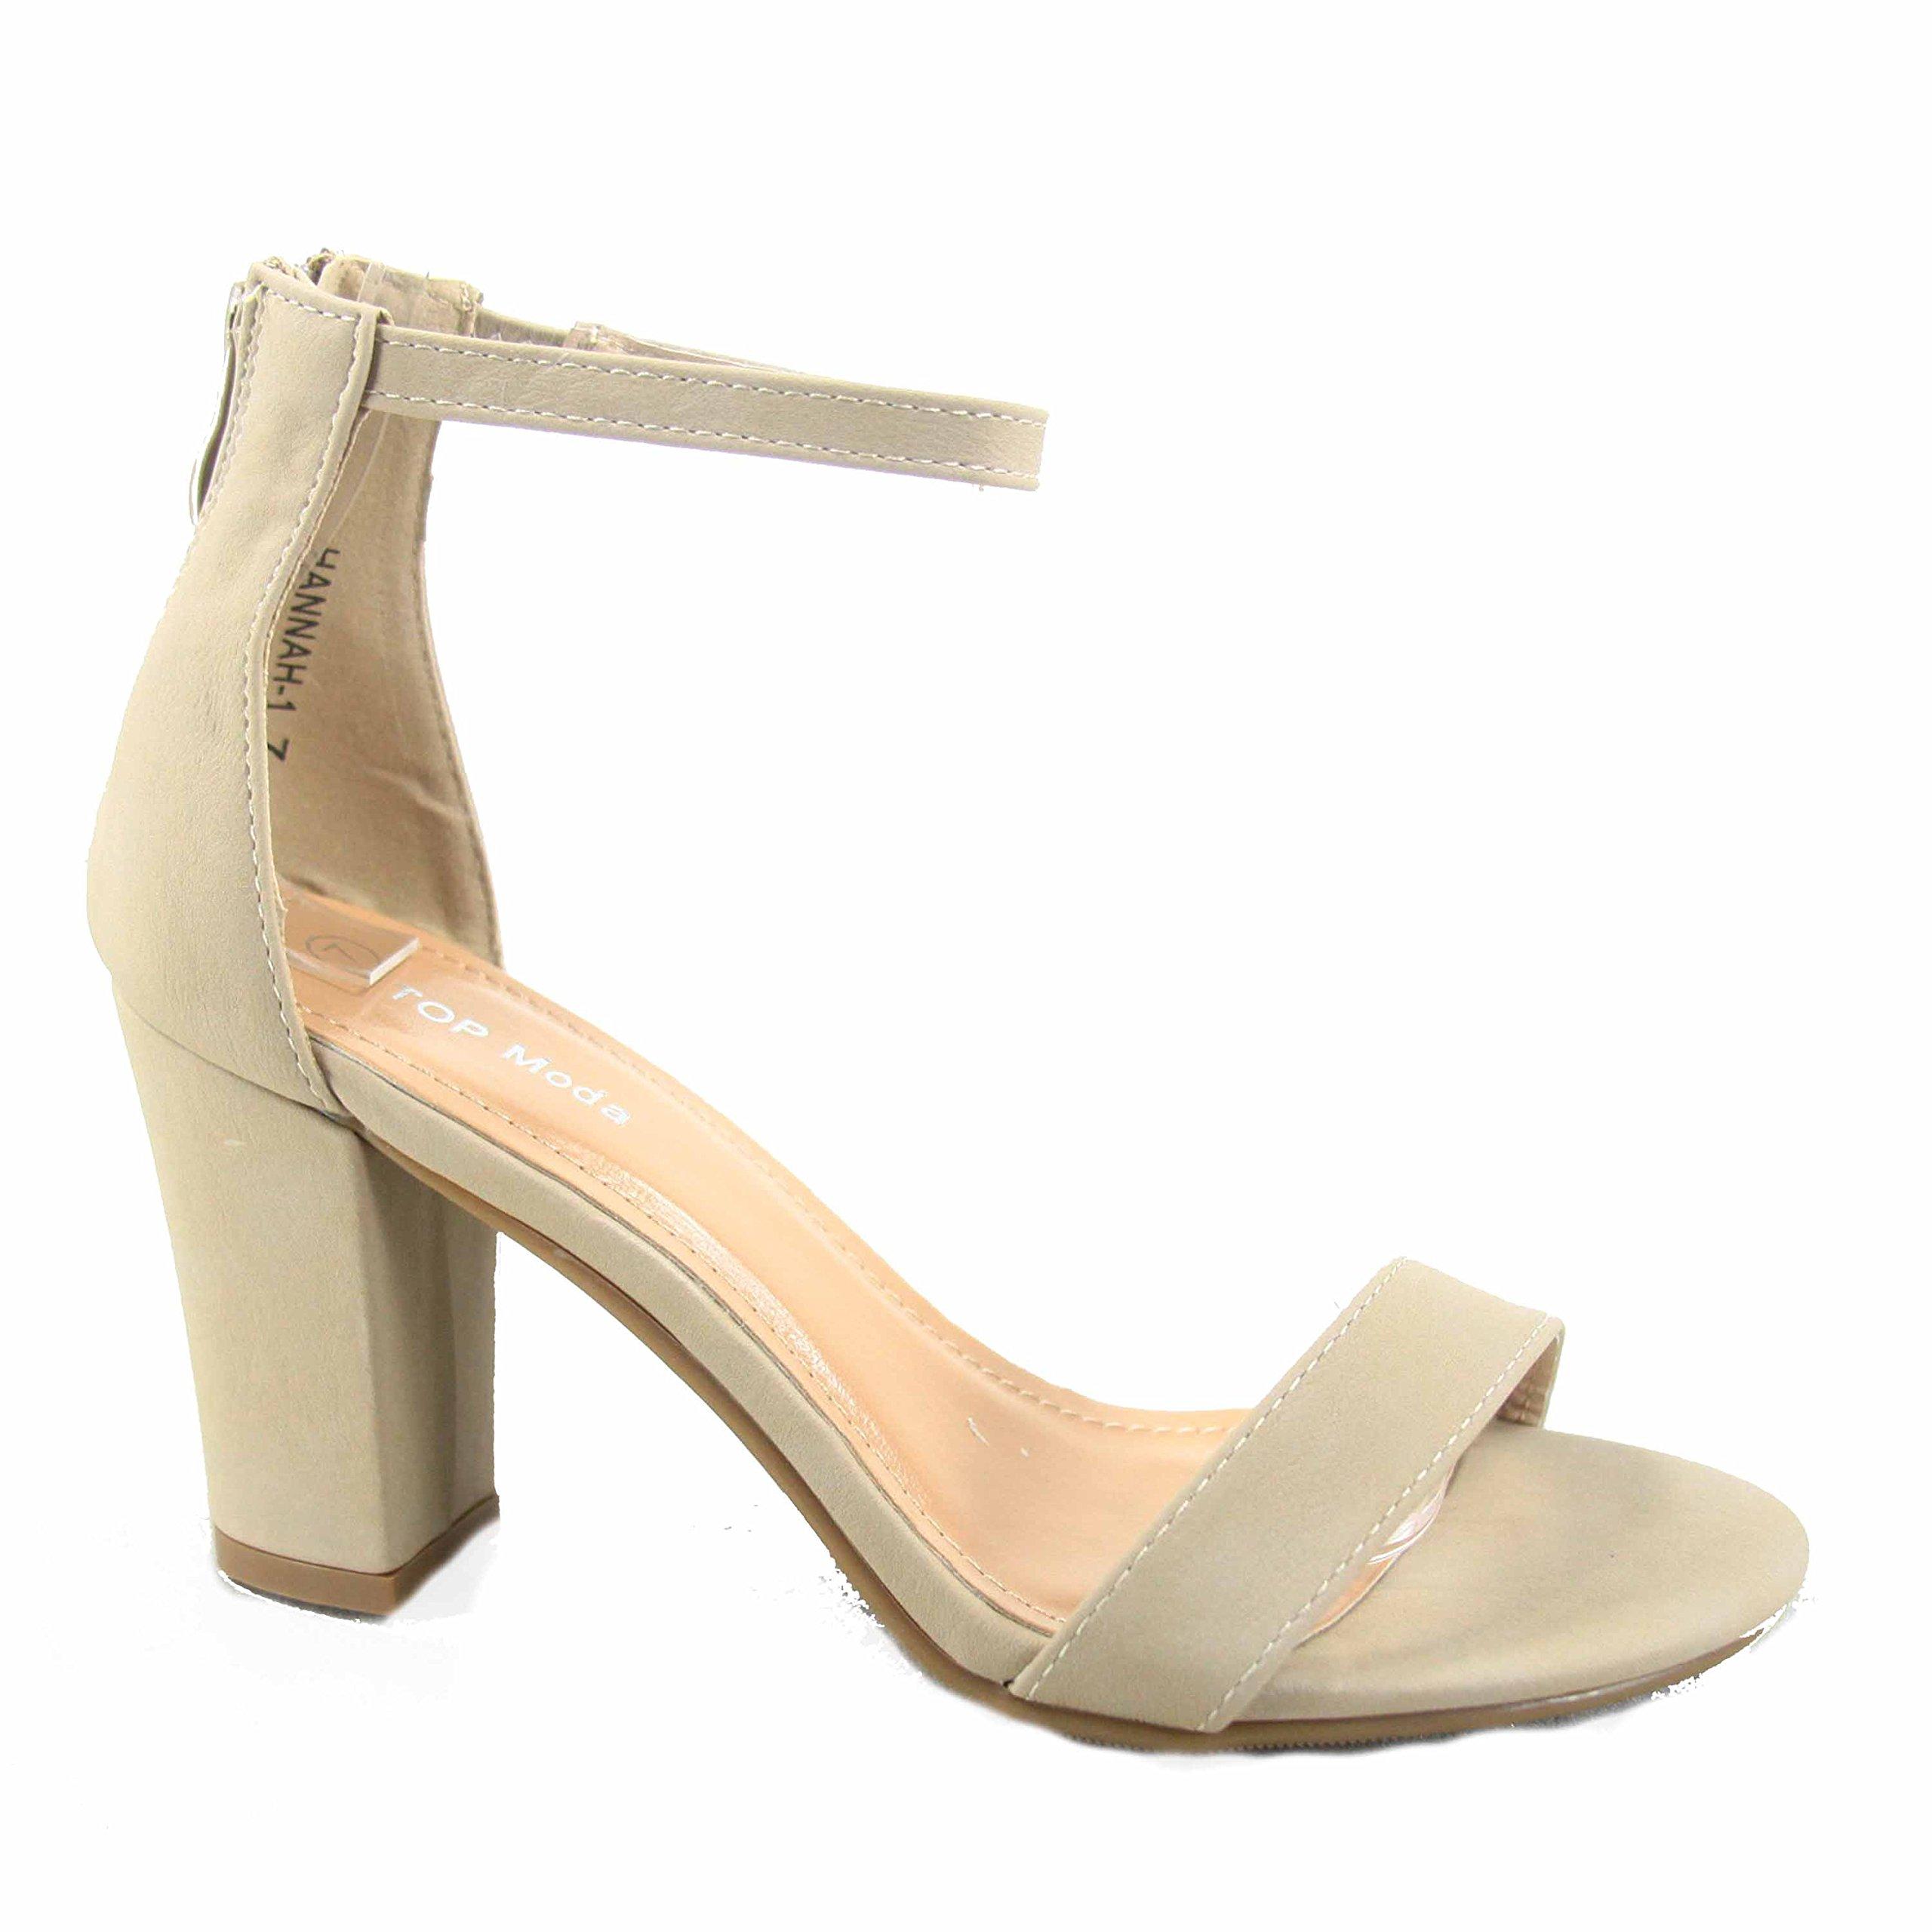 Top Moda Hannah-1 Women's Fashion Ankle Strap Evening Dress High Heel Sandal Shoes (7.5 B(M) US, Beige)